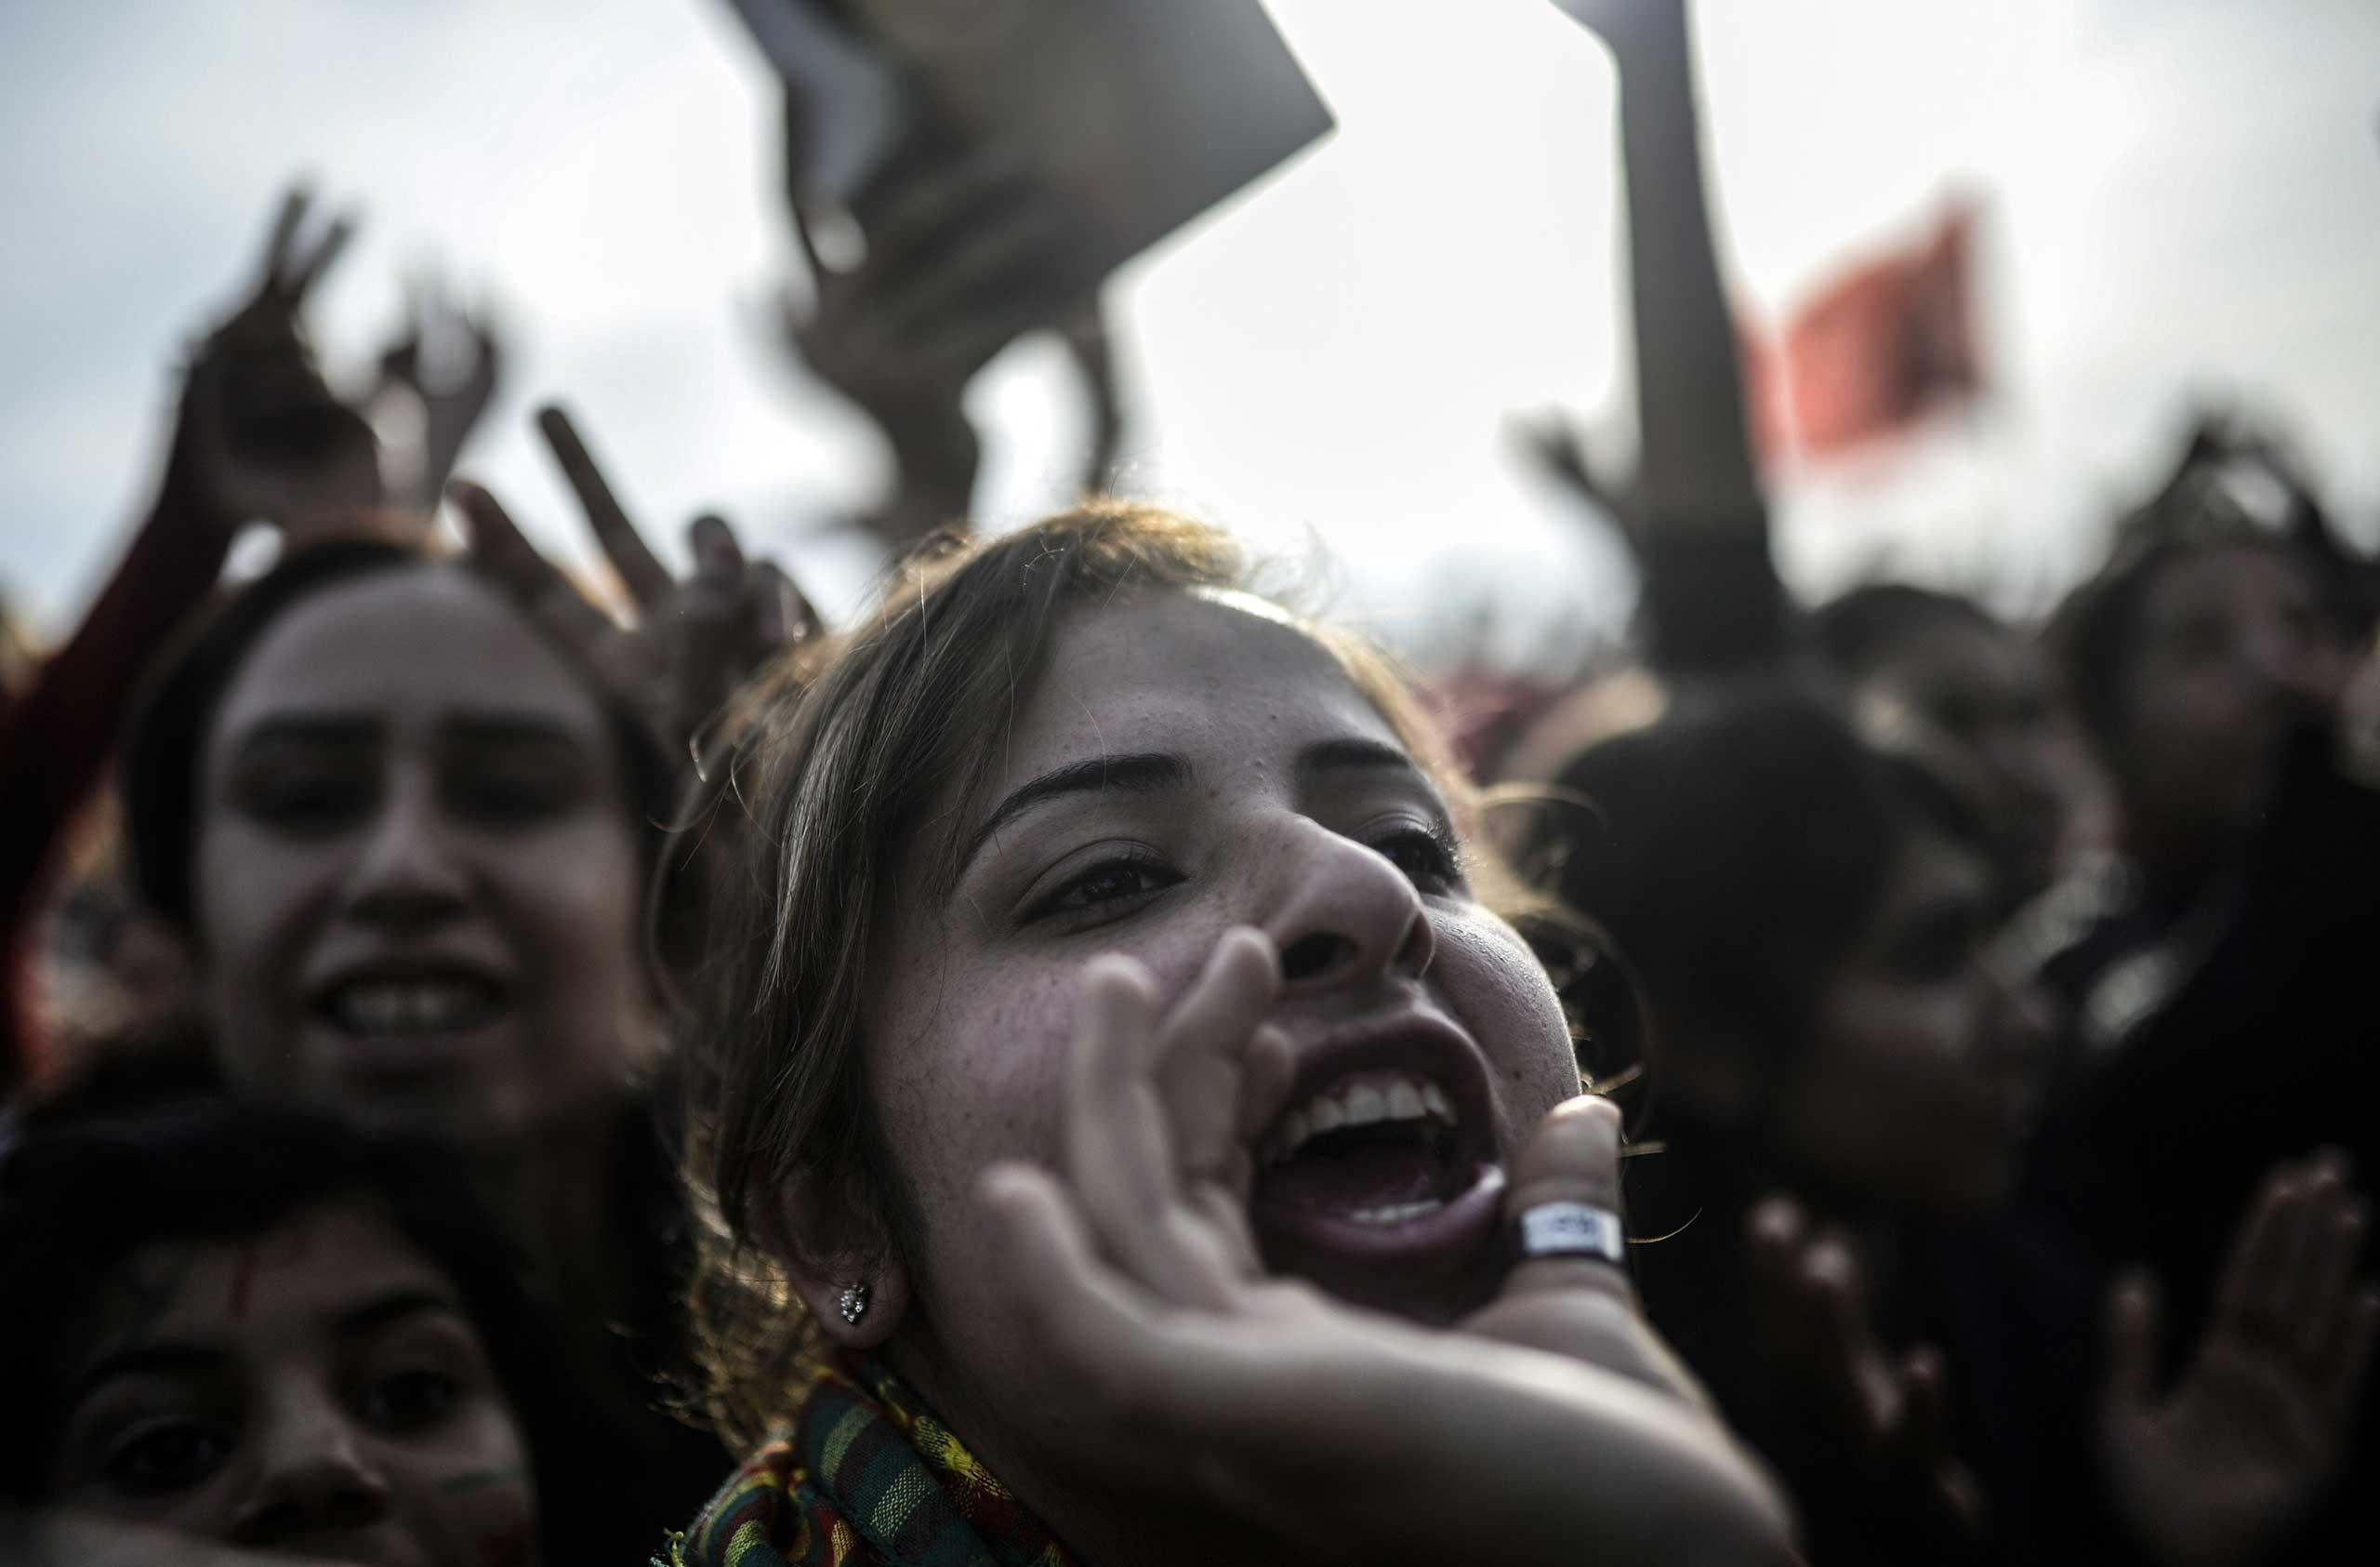 Kurdish women attend a celebration rally  near the Turkish-Syrian border in Suruc, Turkey, on Jan. 27, 2015.